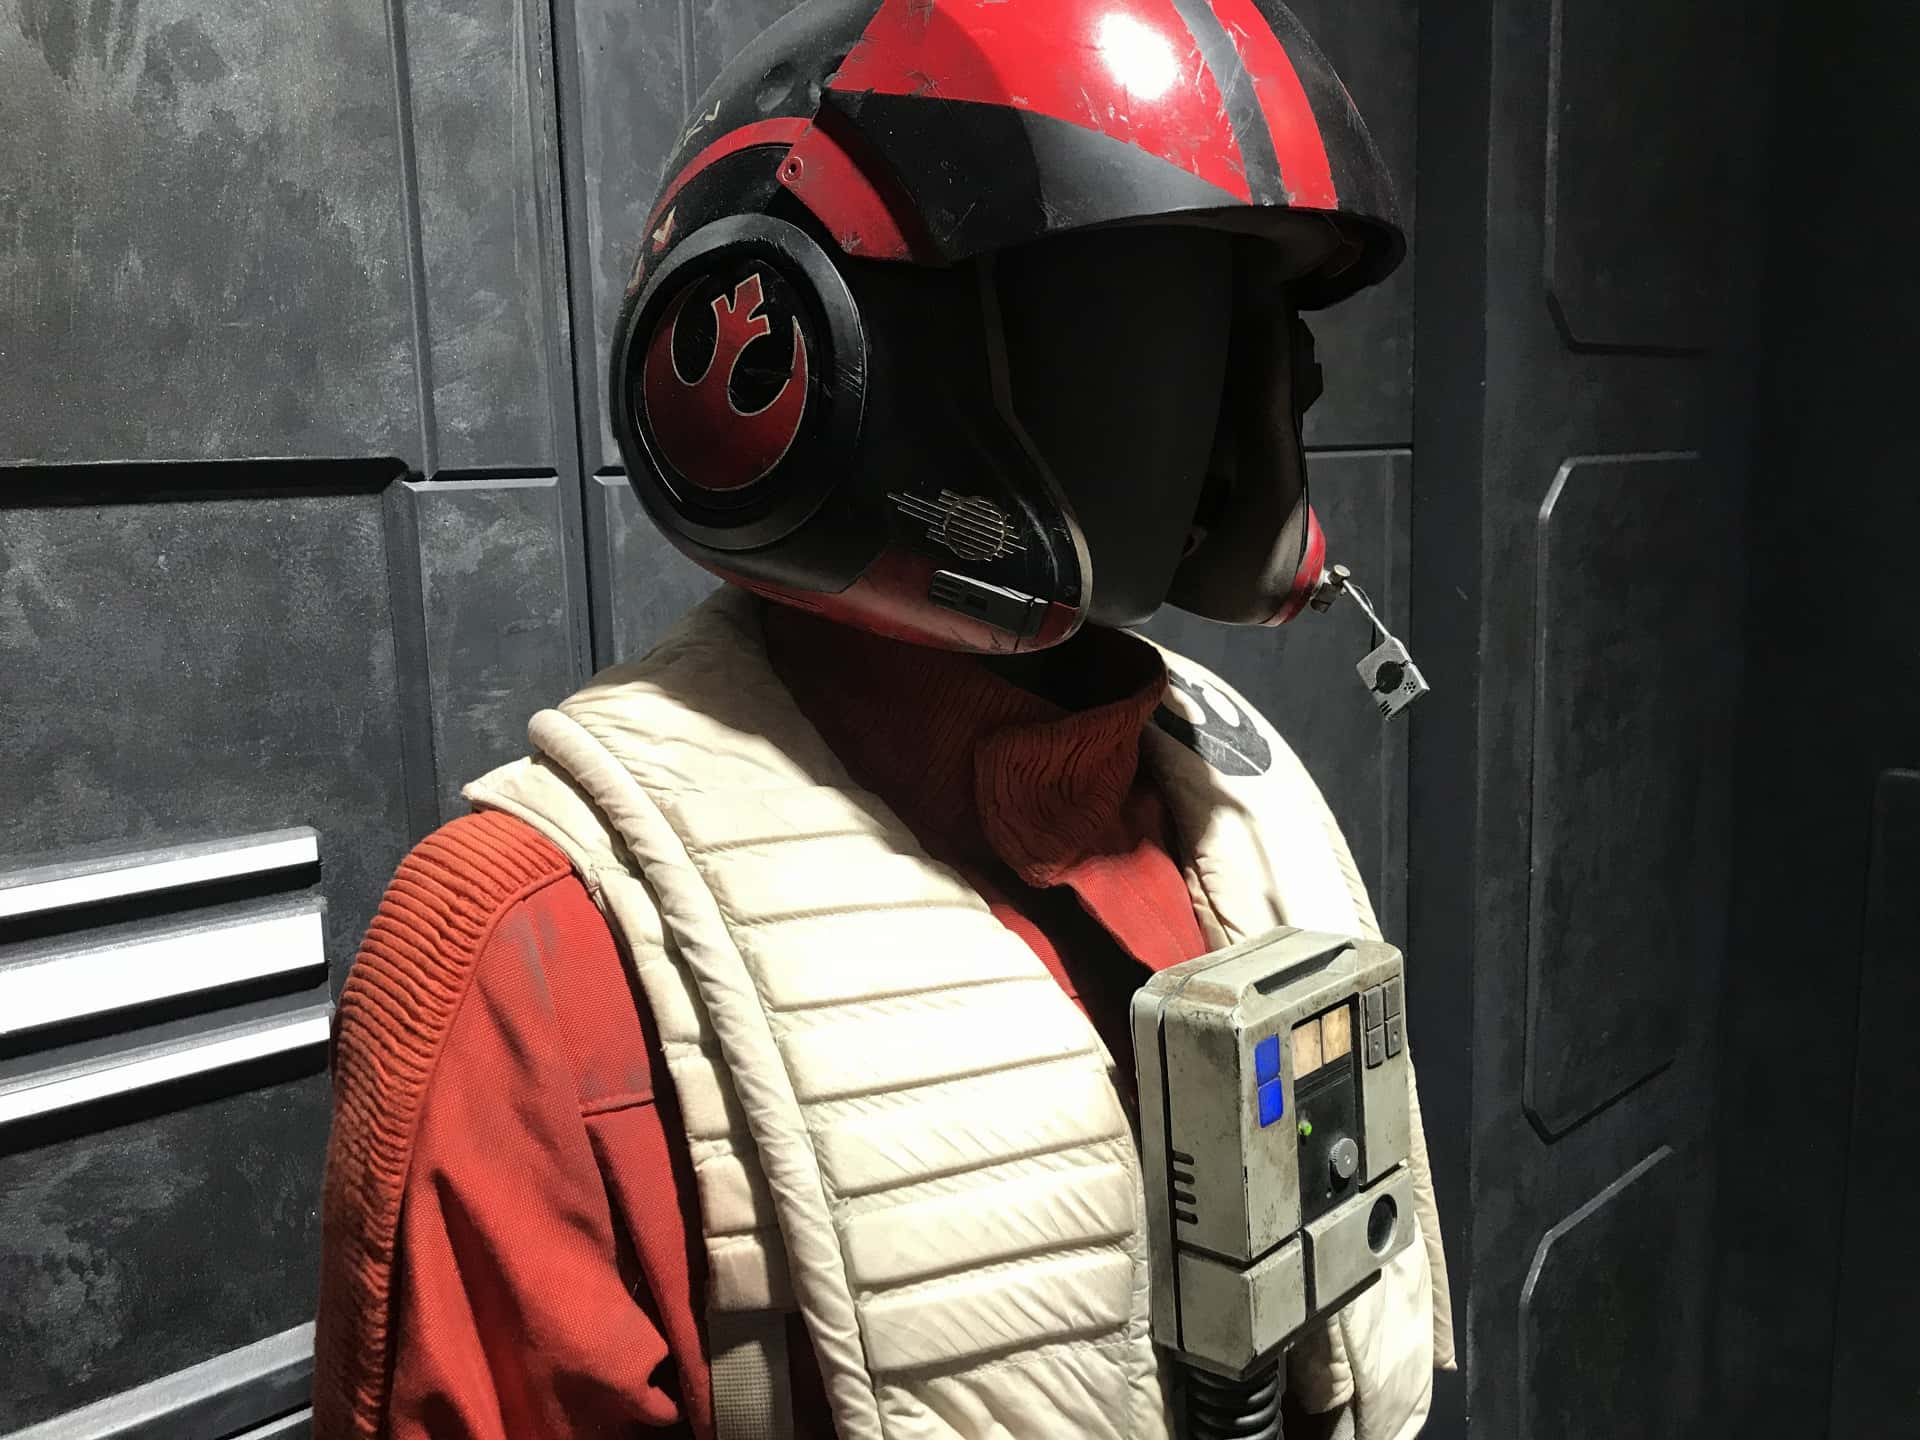 Star Wars Os Últimos Jedi NYCC (46)